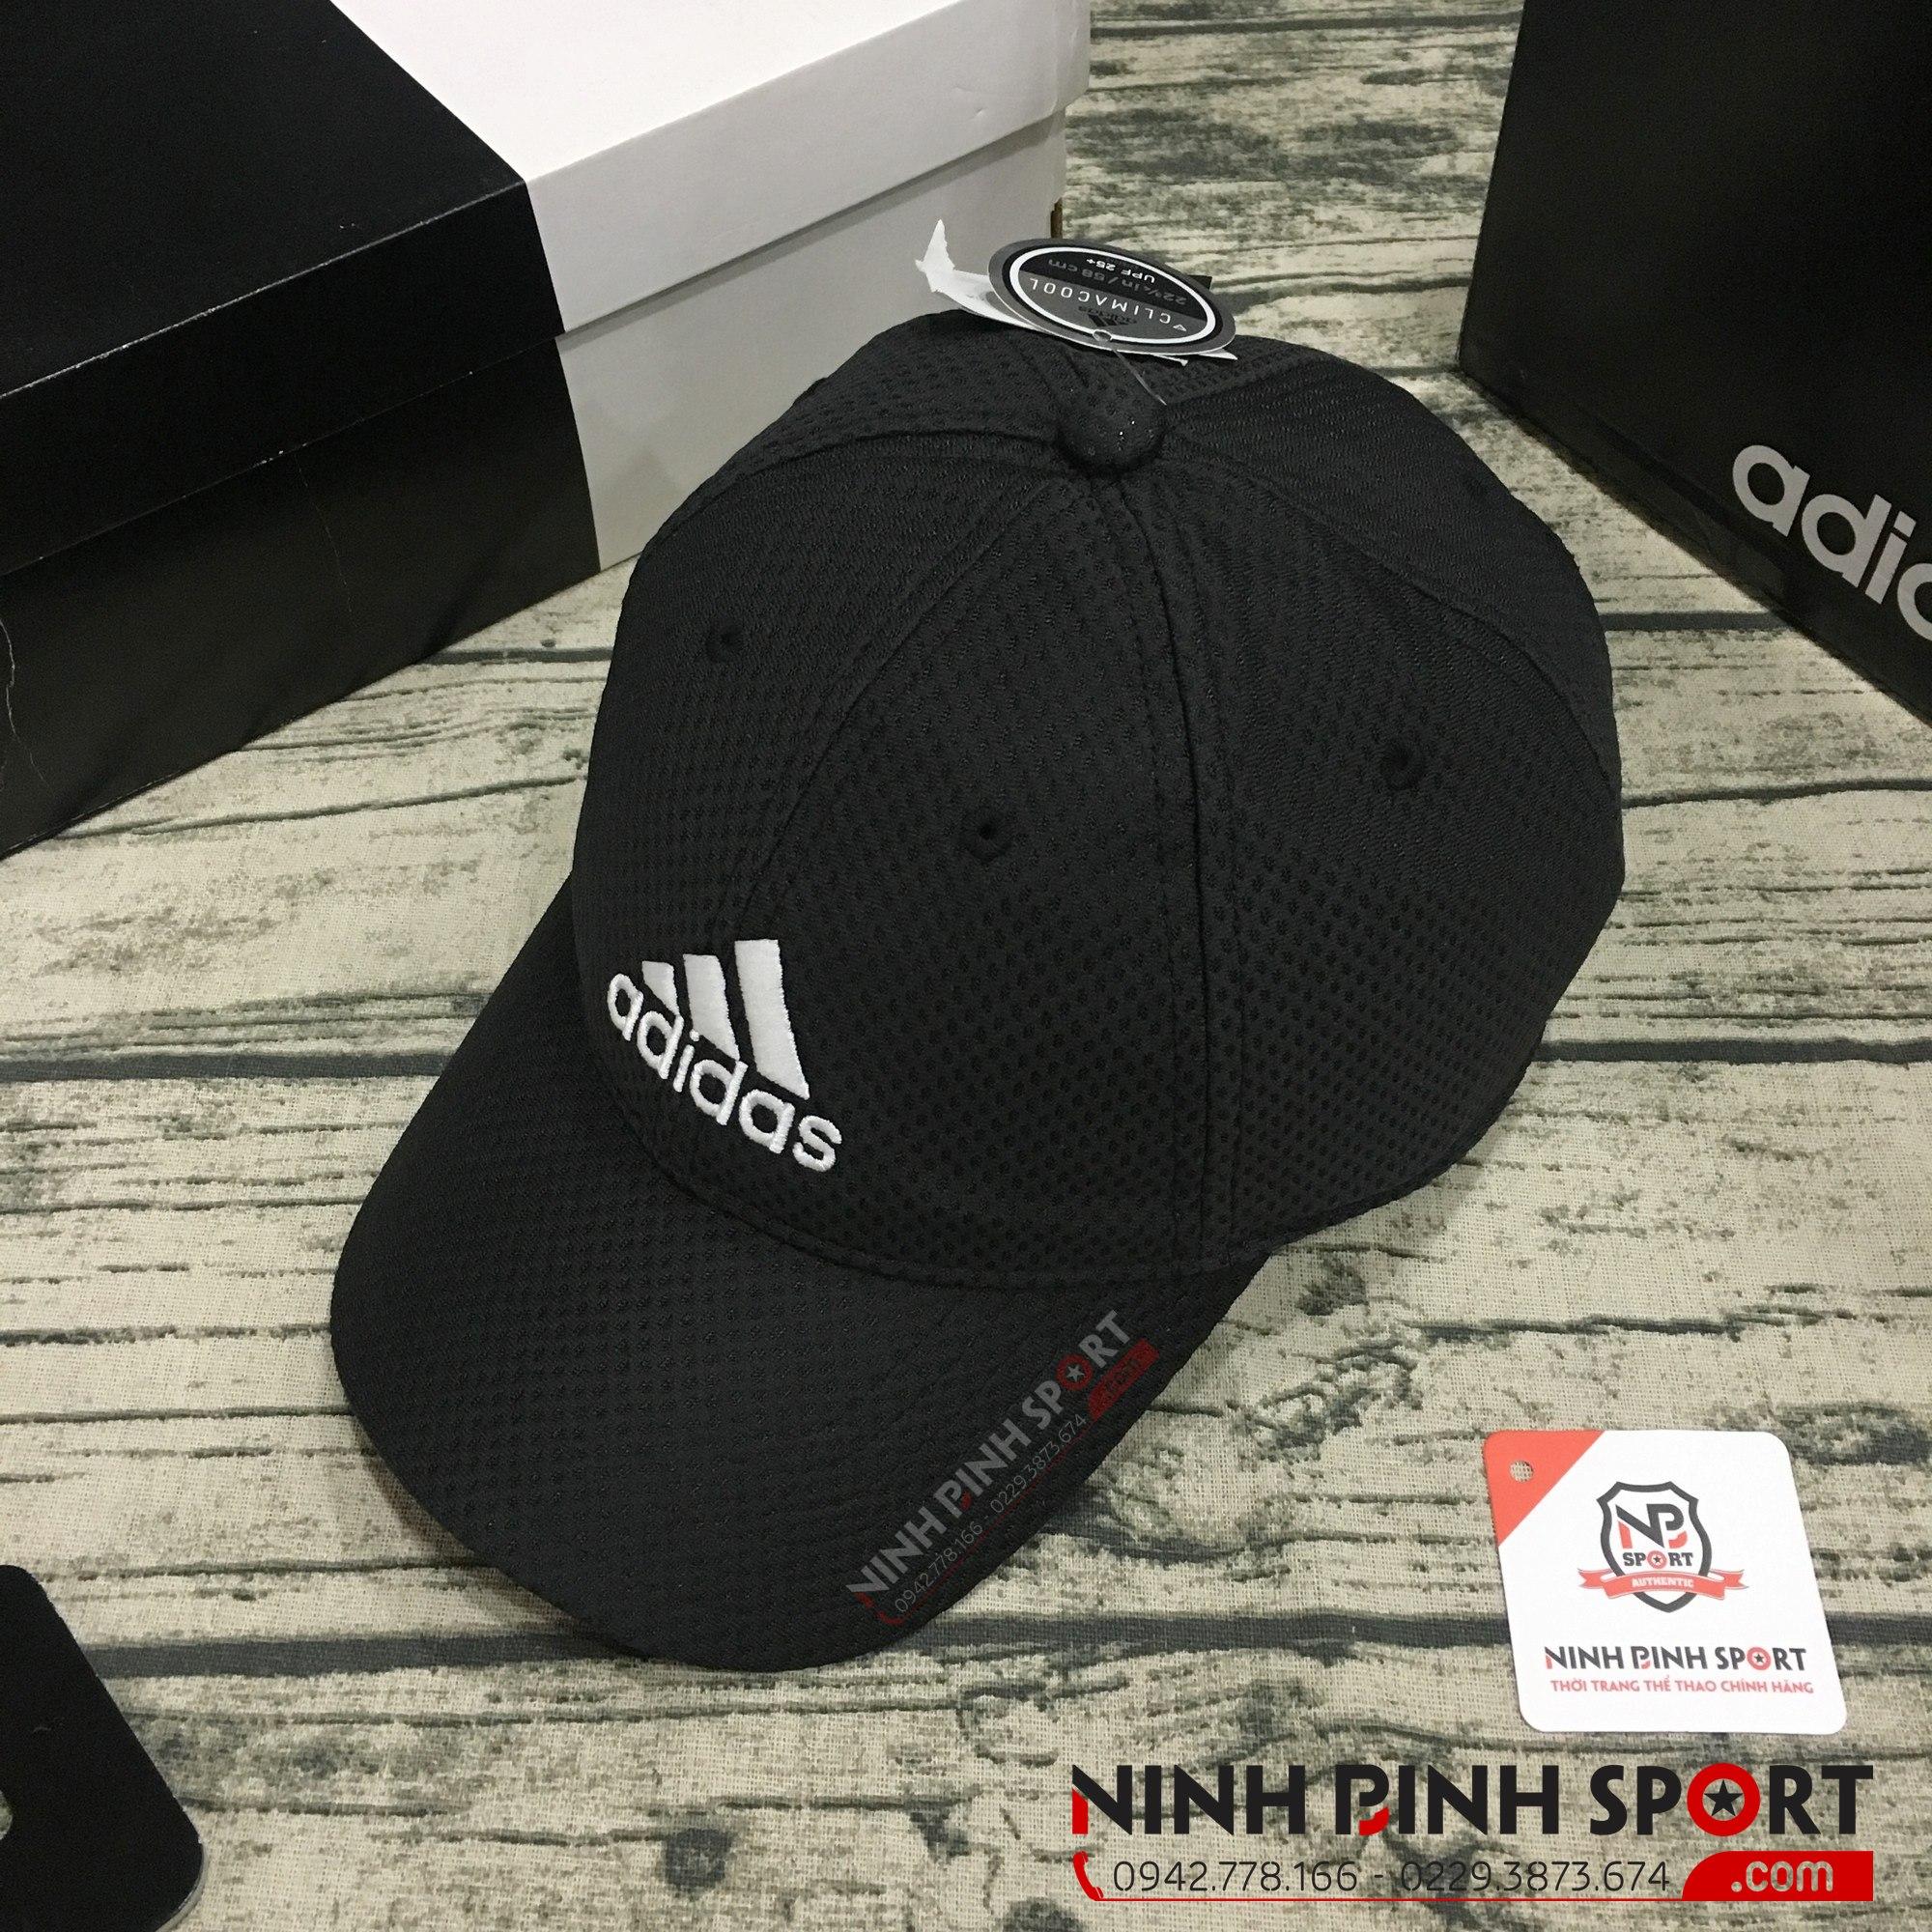 Mũ thể thao Adidas C40 Climacool Black CG1788